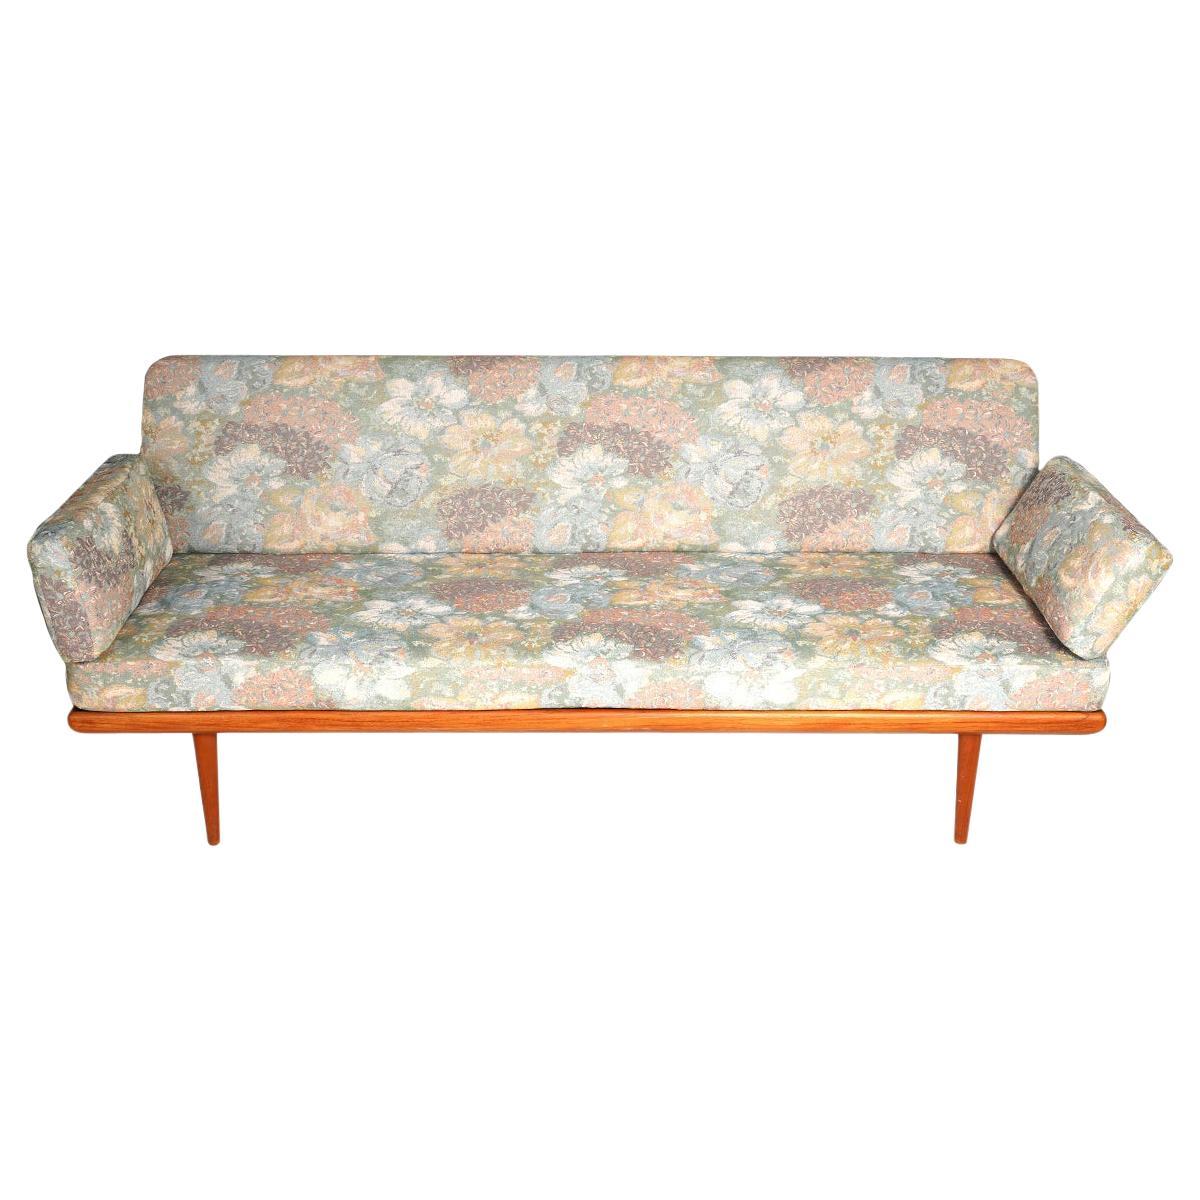 Mid Century Teak Sofa and Daybed by Hvidt & Mølgaard for France & Son, Denmark